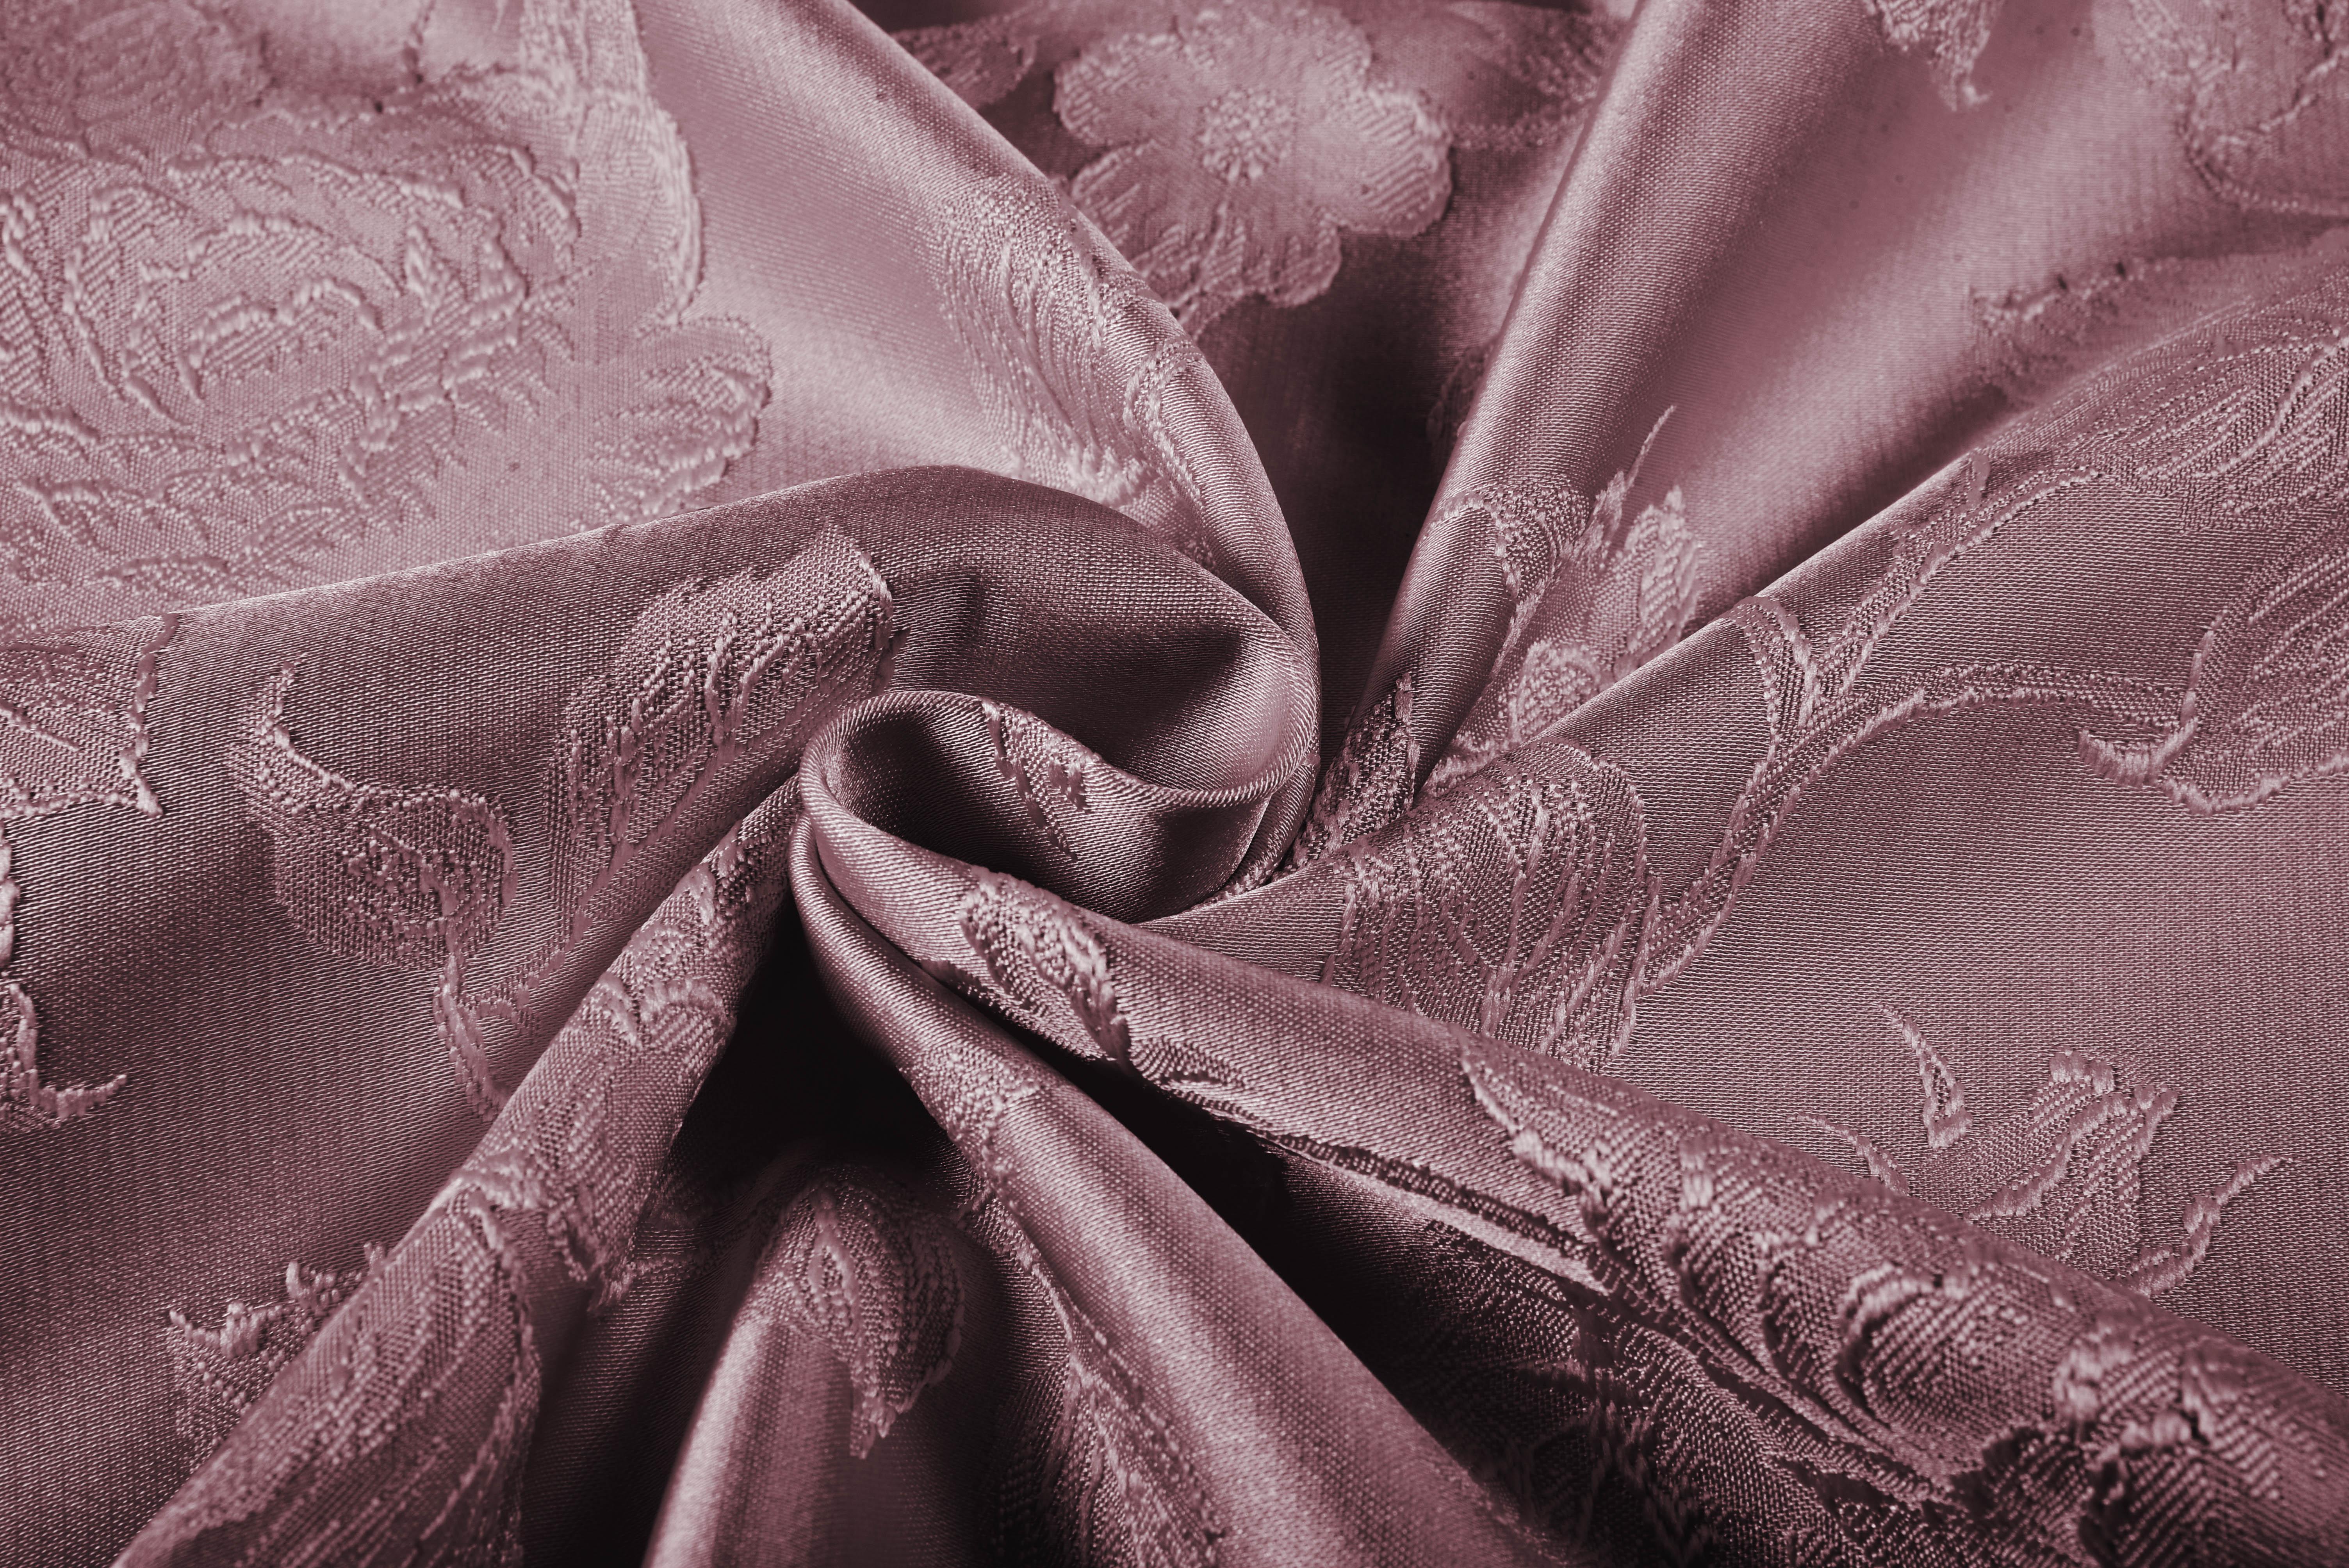 {} TexRepublic Материал Жаккард Flower Fantasy Цвет: Брусника texrepublic материал бархат wet silk цвет брусника